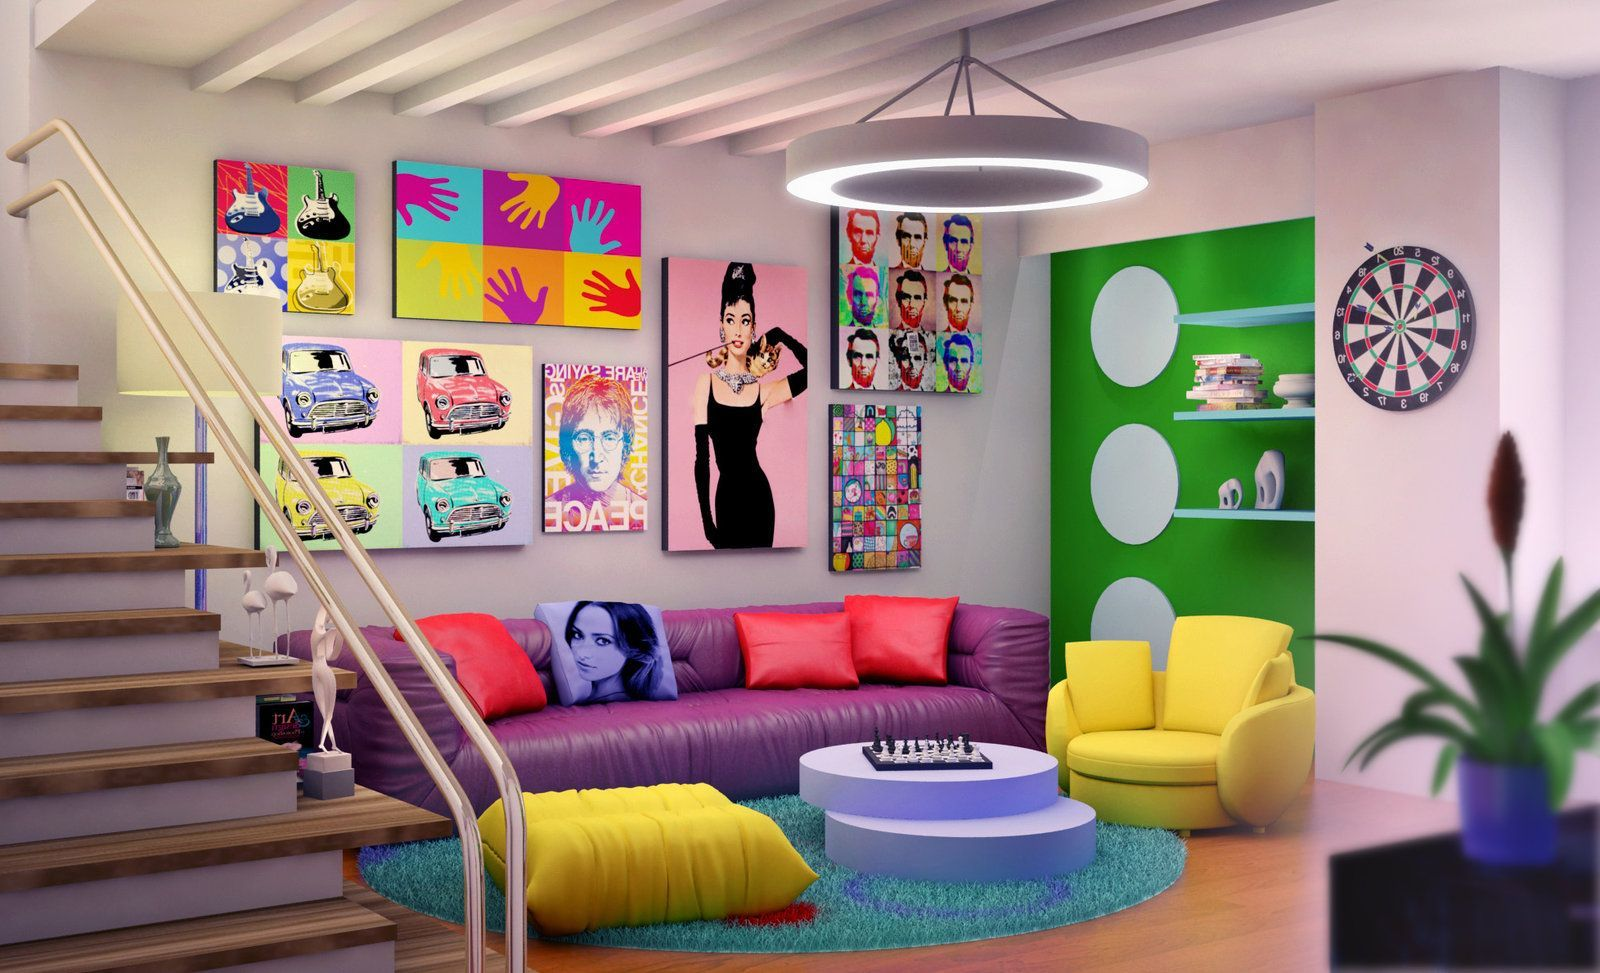 Interior Pop Art Interior Design And Decor Ideas For